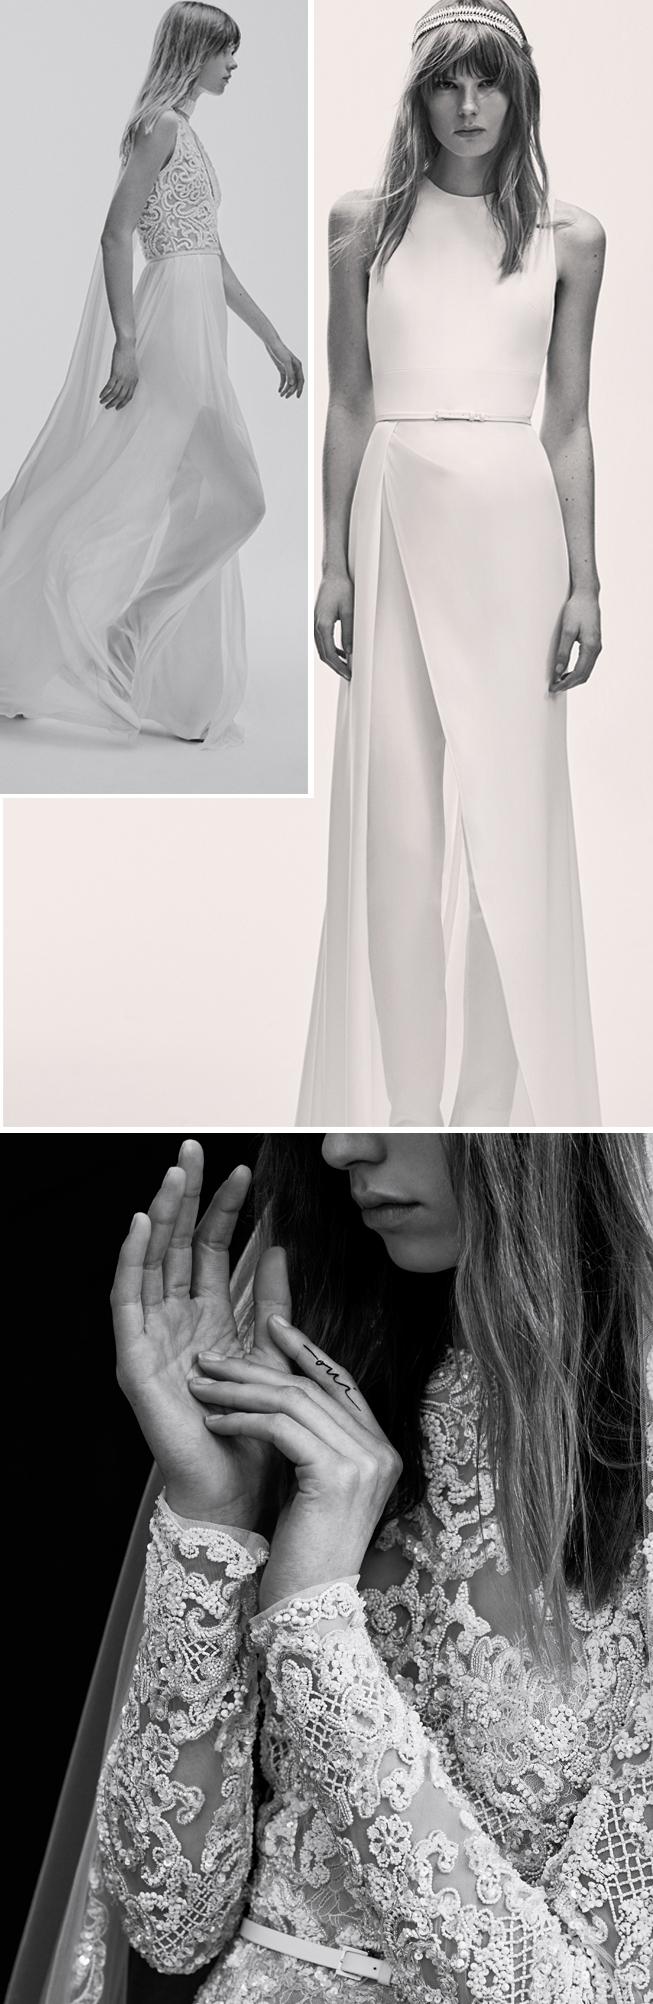 Elie Saab, Elie Saab Bridal, Bridal Gowns, Perfect wedding Blog, Perfect Wedding Magazine, Bridal Fashion, Oui, Haute Couture